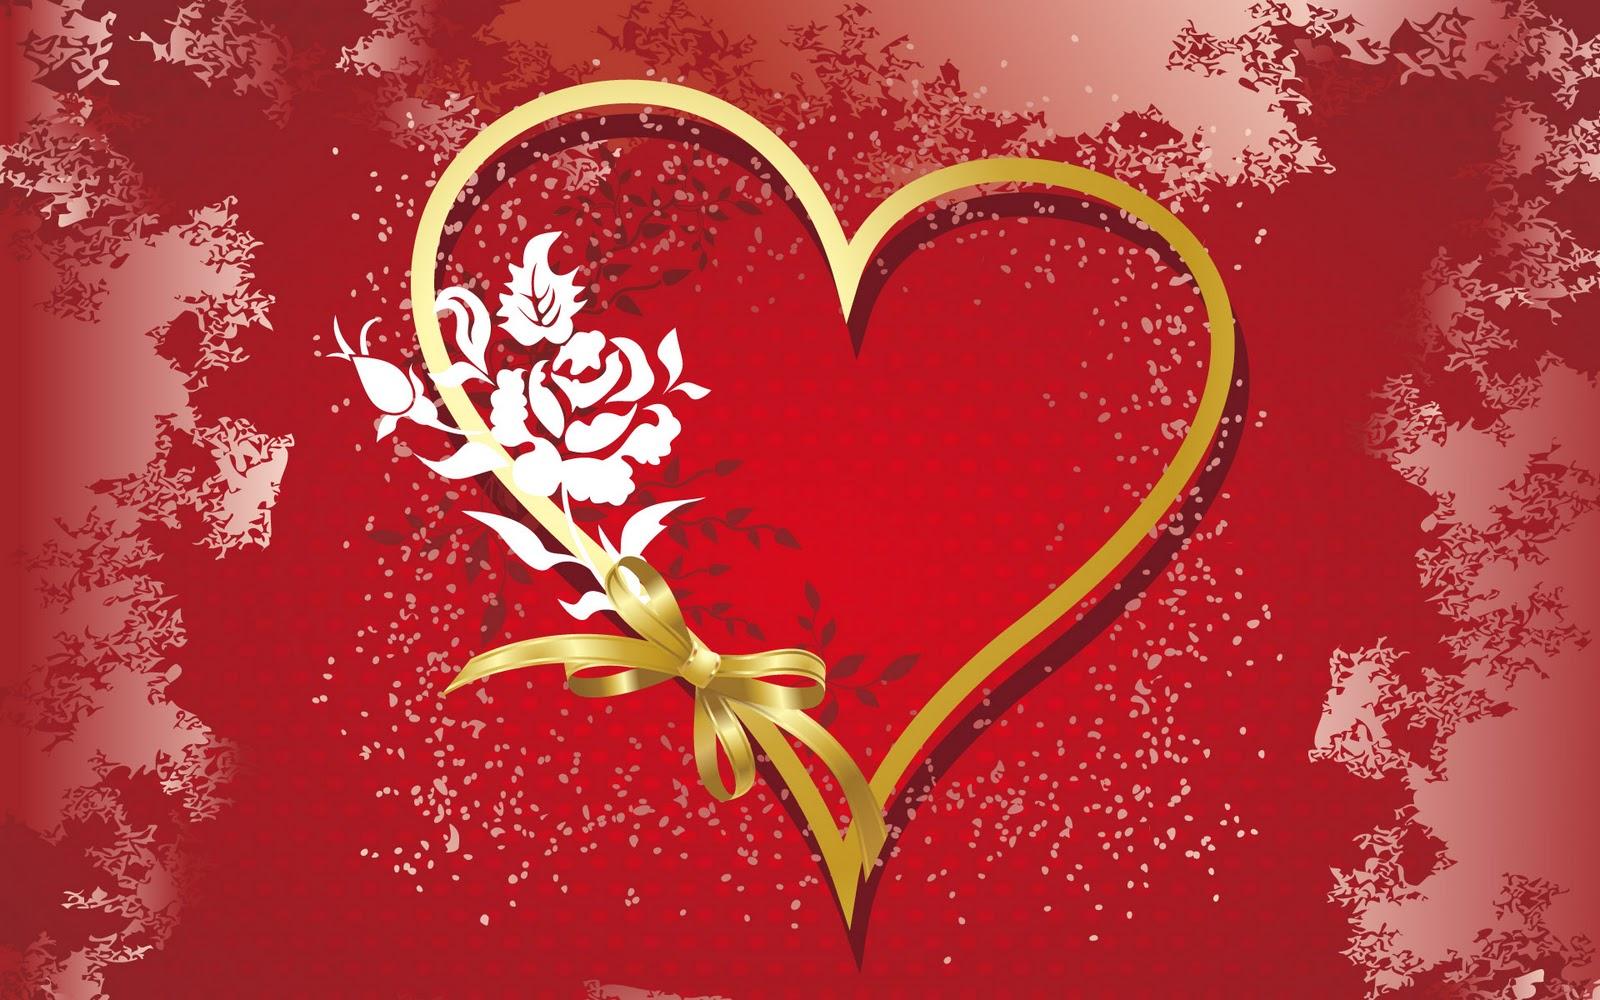 http://2.bp.blogspot.com/_pdgu7Y_jrv0/TUXt2axAnbI/AAAAAAAAADM/yaLXy3OLcQ4/s1600/Beautiful-love-wallpaper.jpg